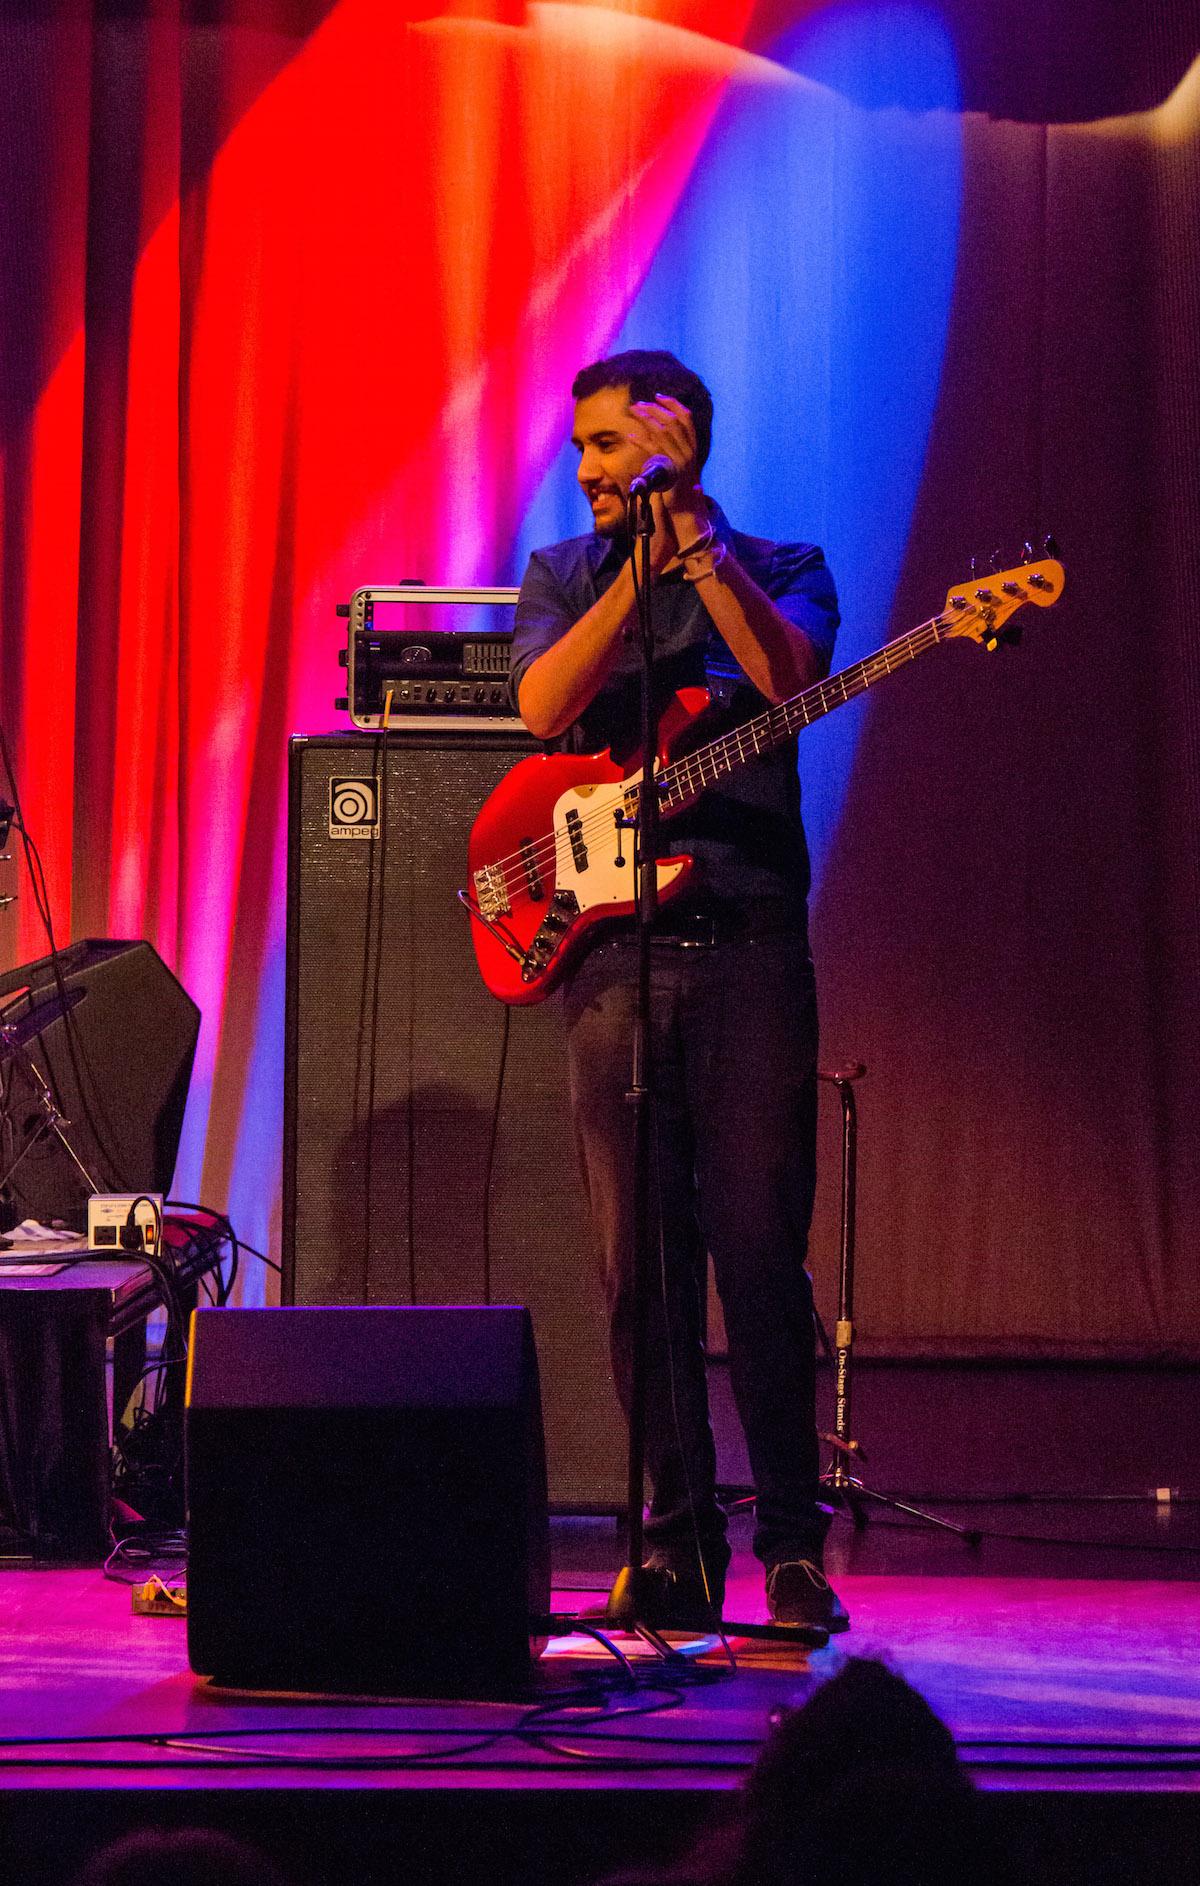 Sanou Ahmed, bassist of Terakaft, invites the audience to clap along. (Jasmine Beaubien/WOUB)